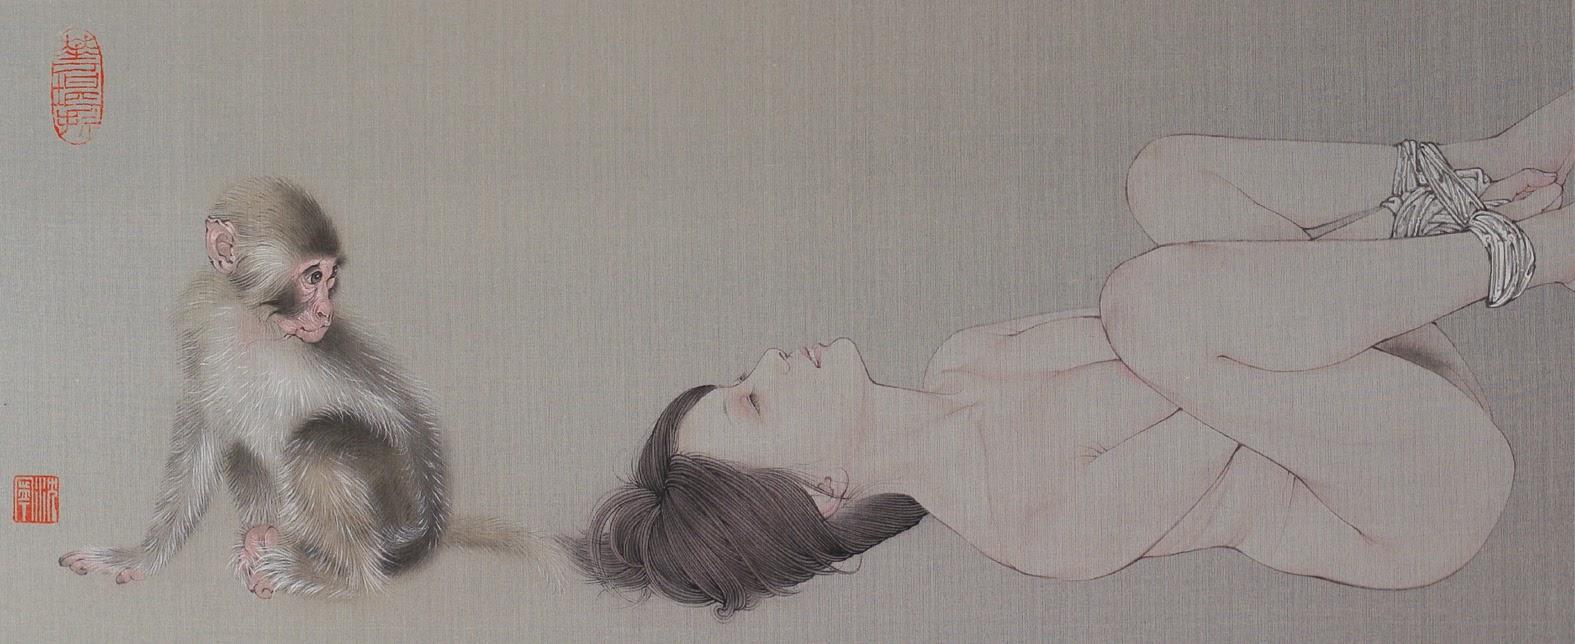 Shen Ning (沈宁)-www.kaifineart.com-6